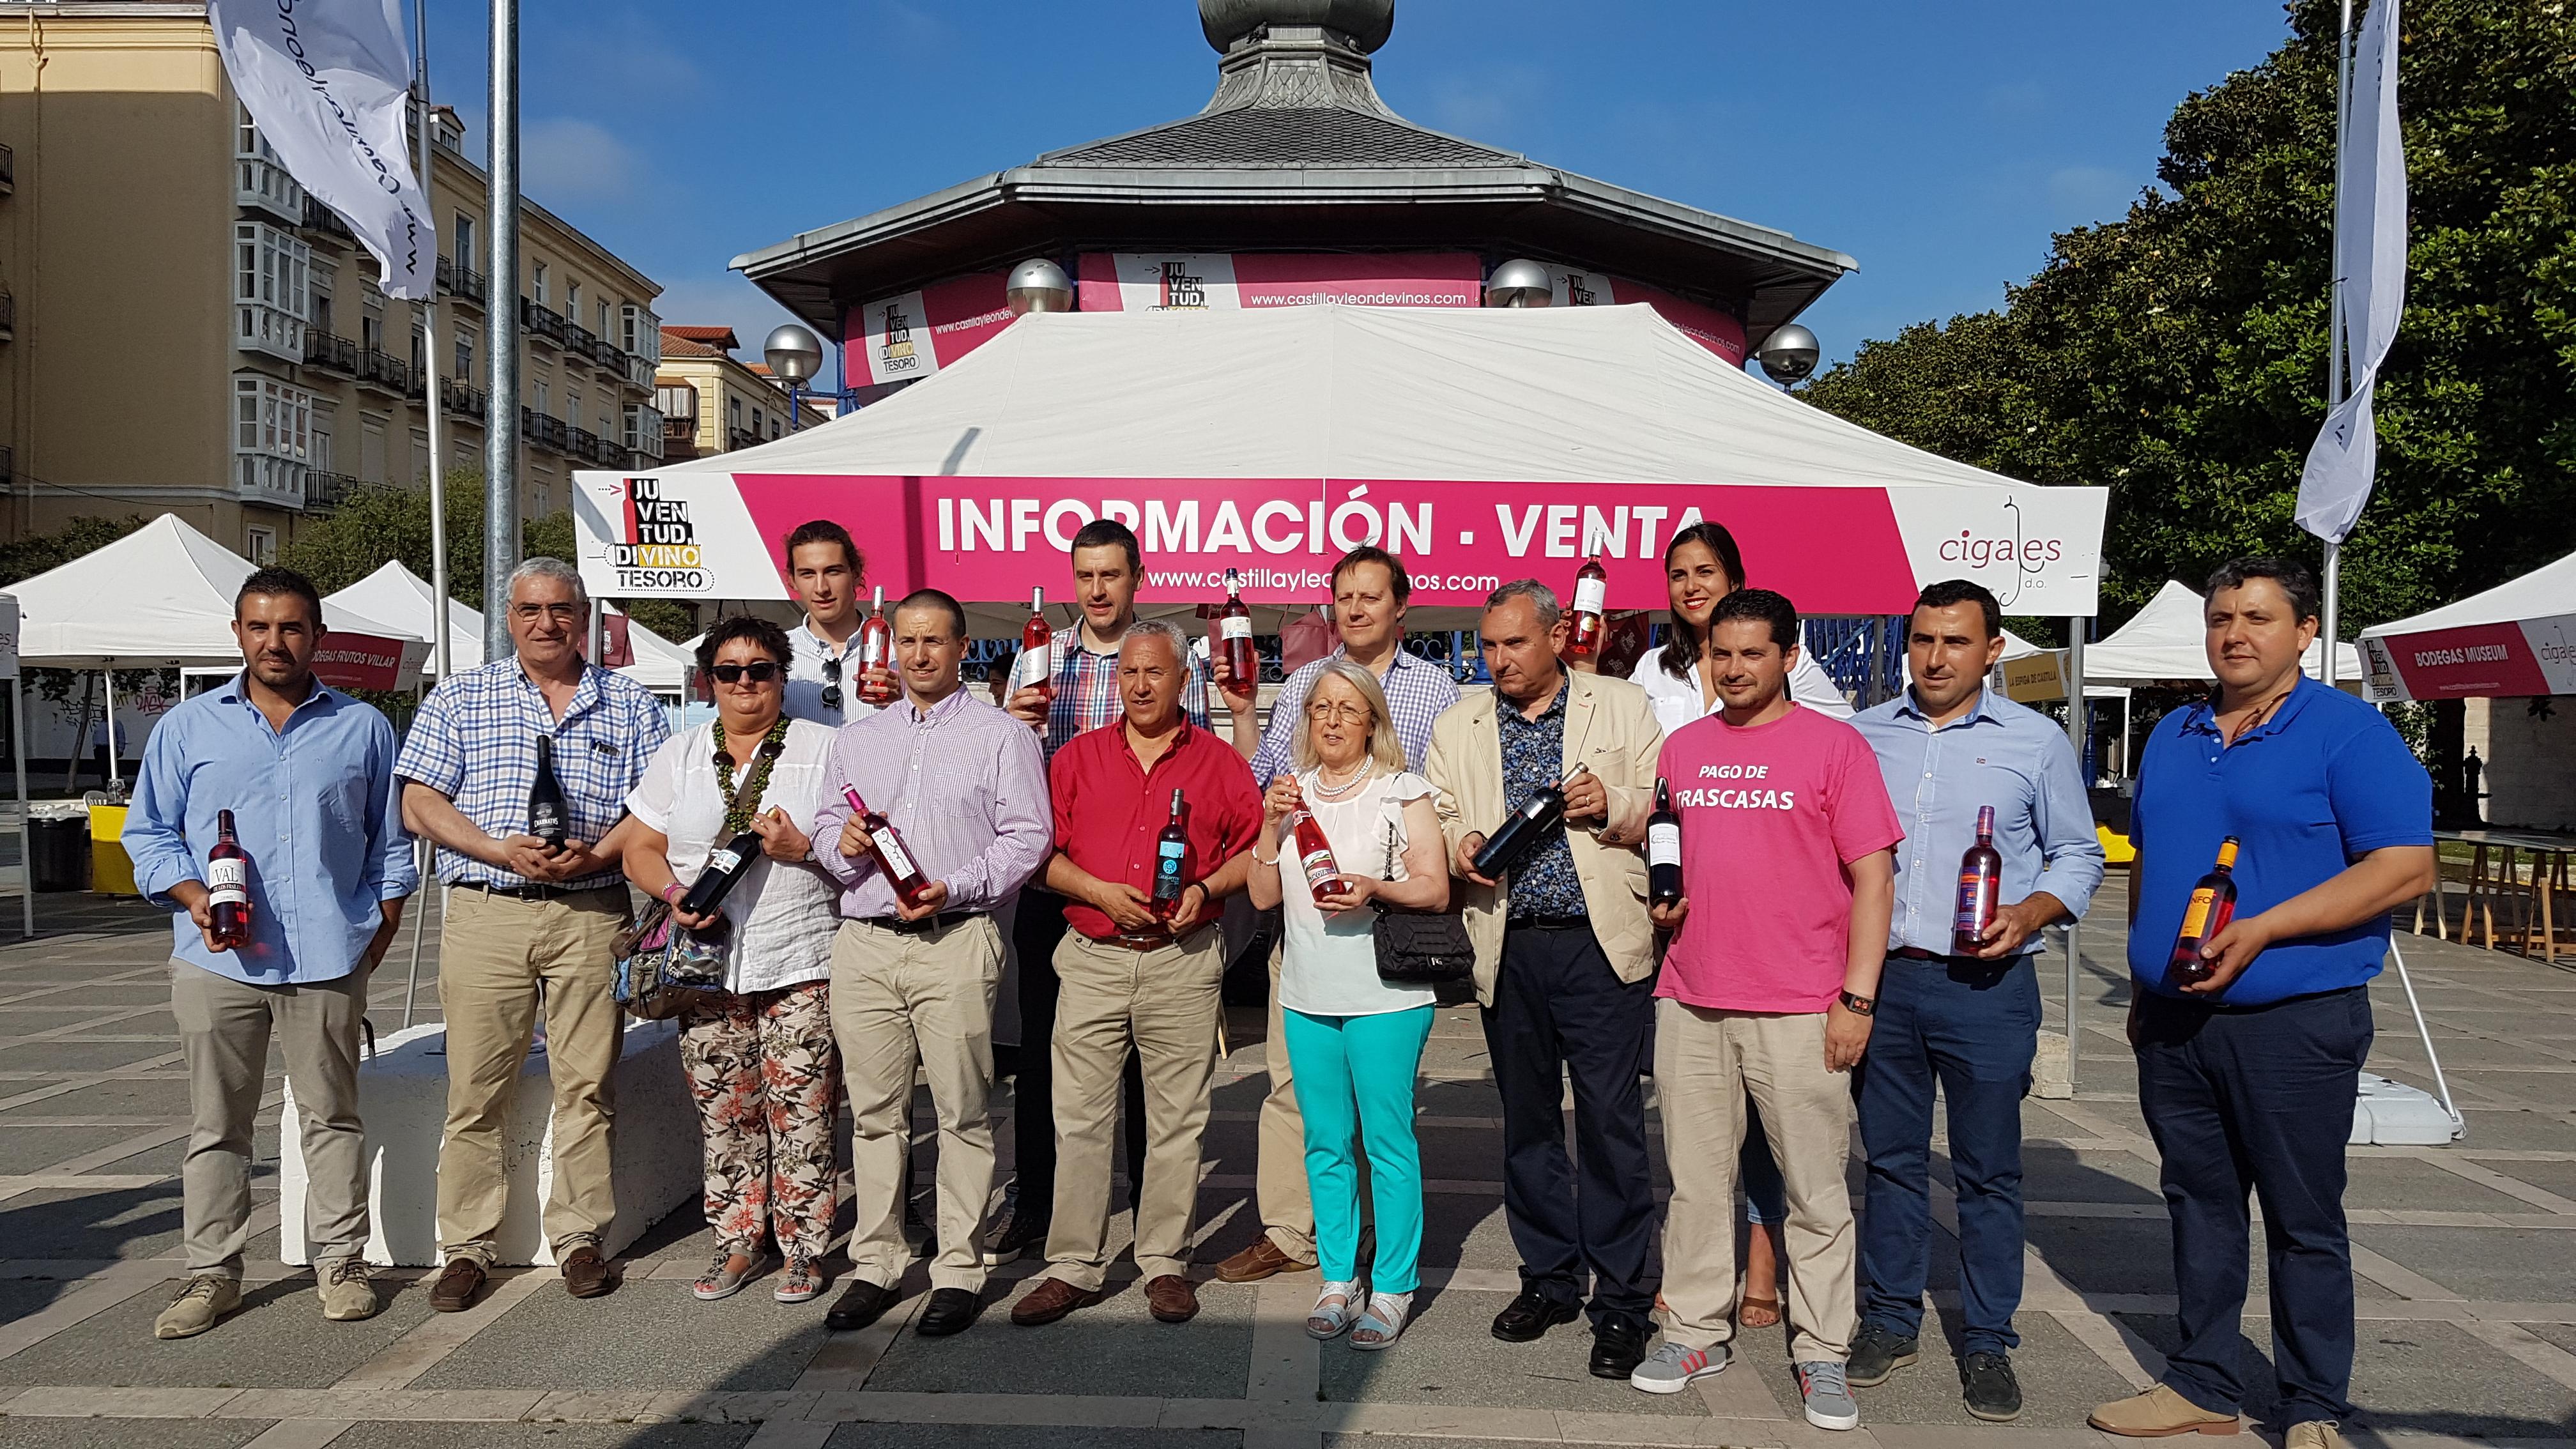 La DO Cigales vuelve a triunfar en Santander